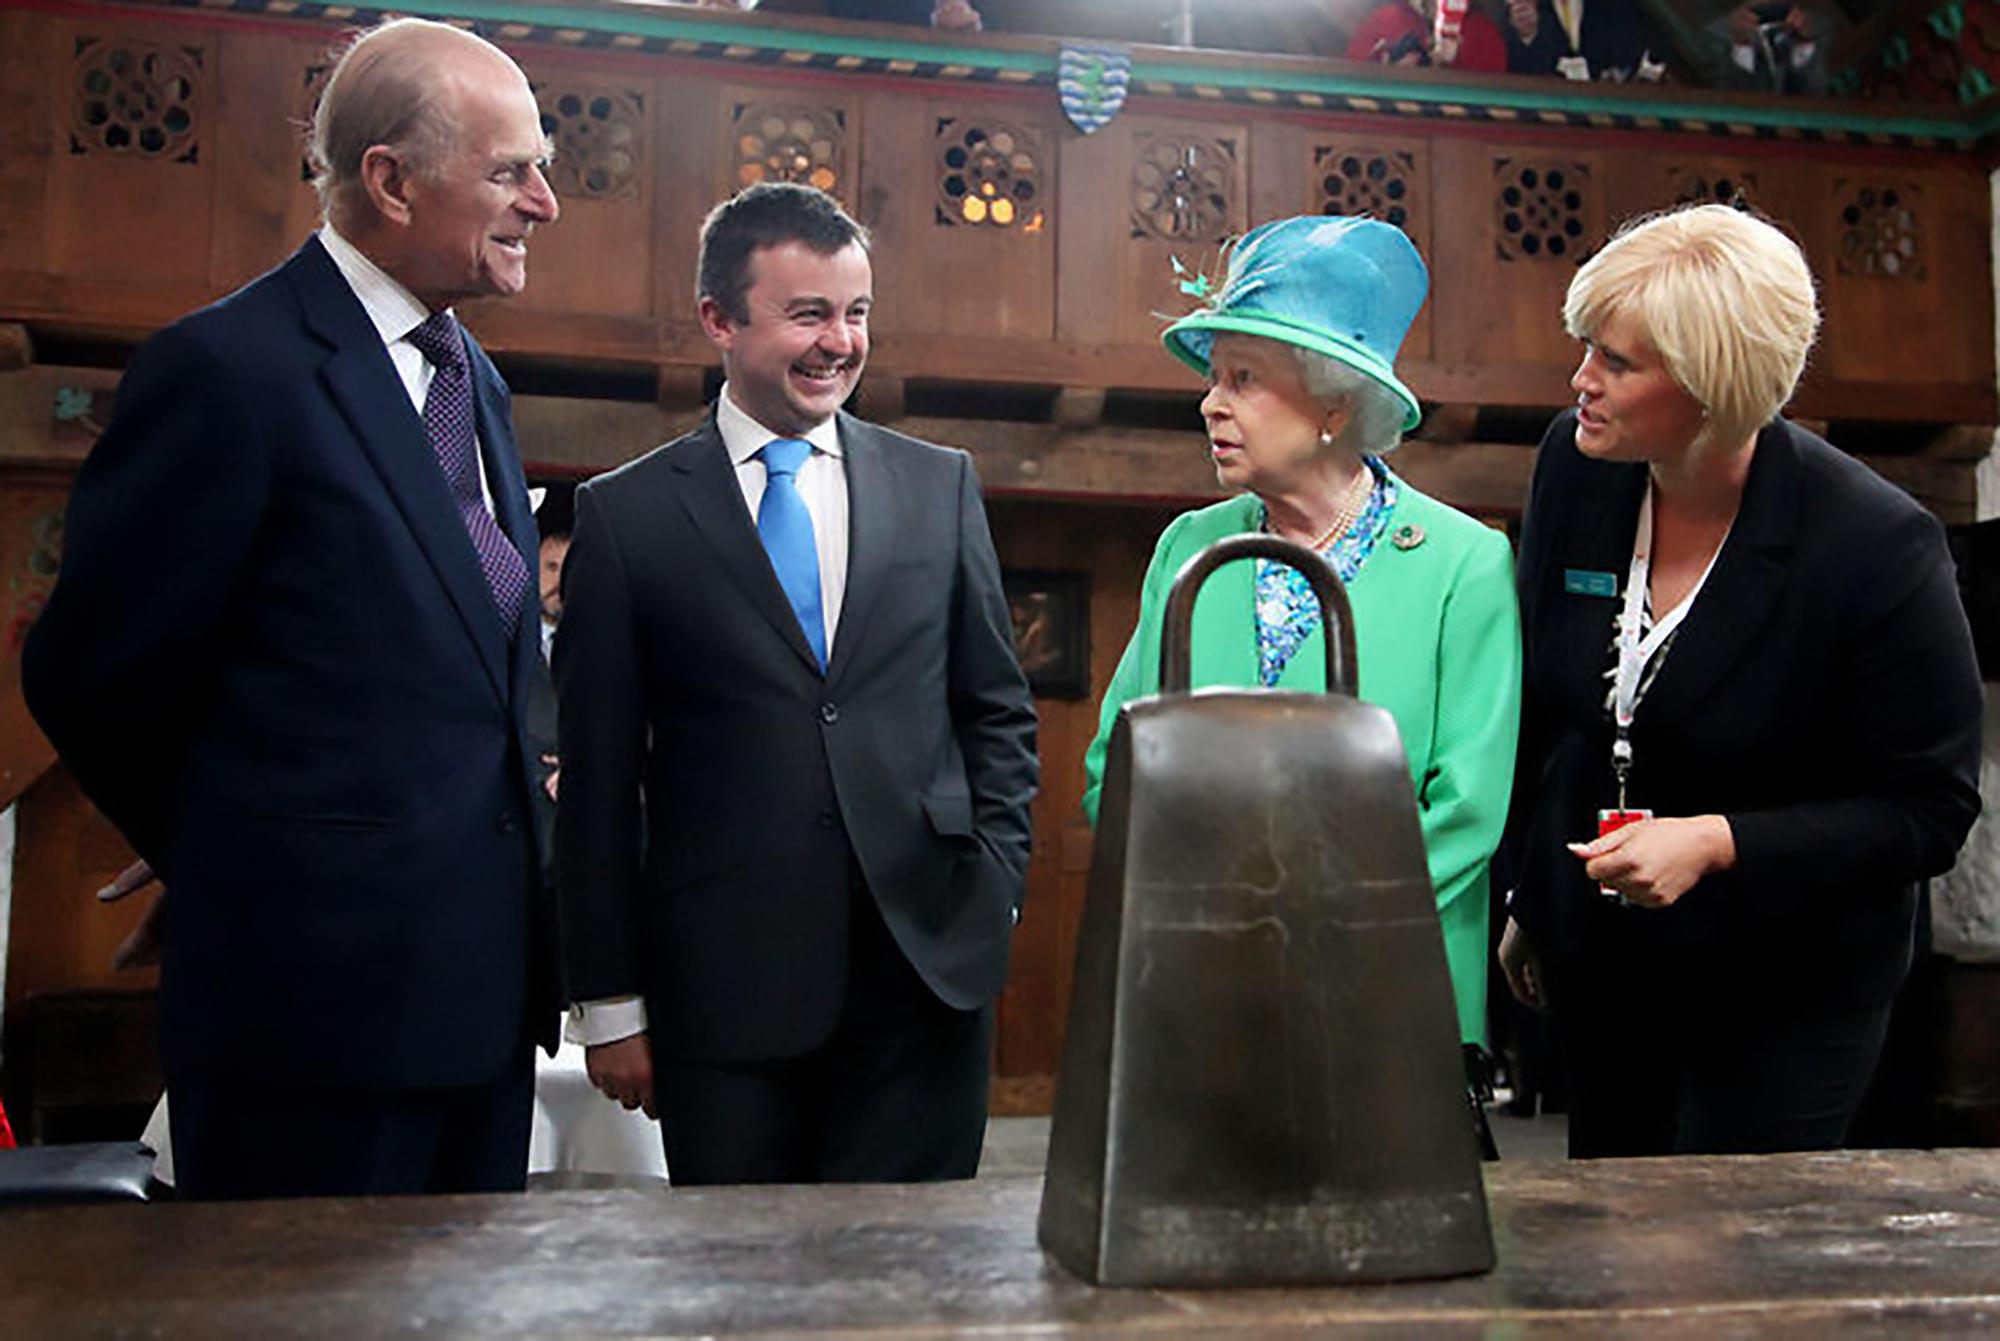 HRH the Duke of Edinburgh, Minister Brian Hayes, HM Queen Elizabeth II, Elaine Moriart